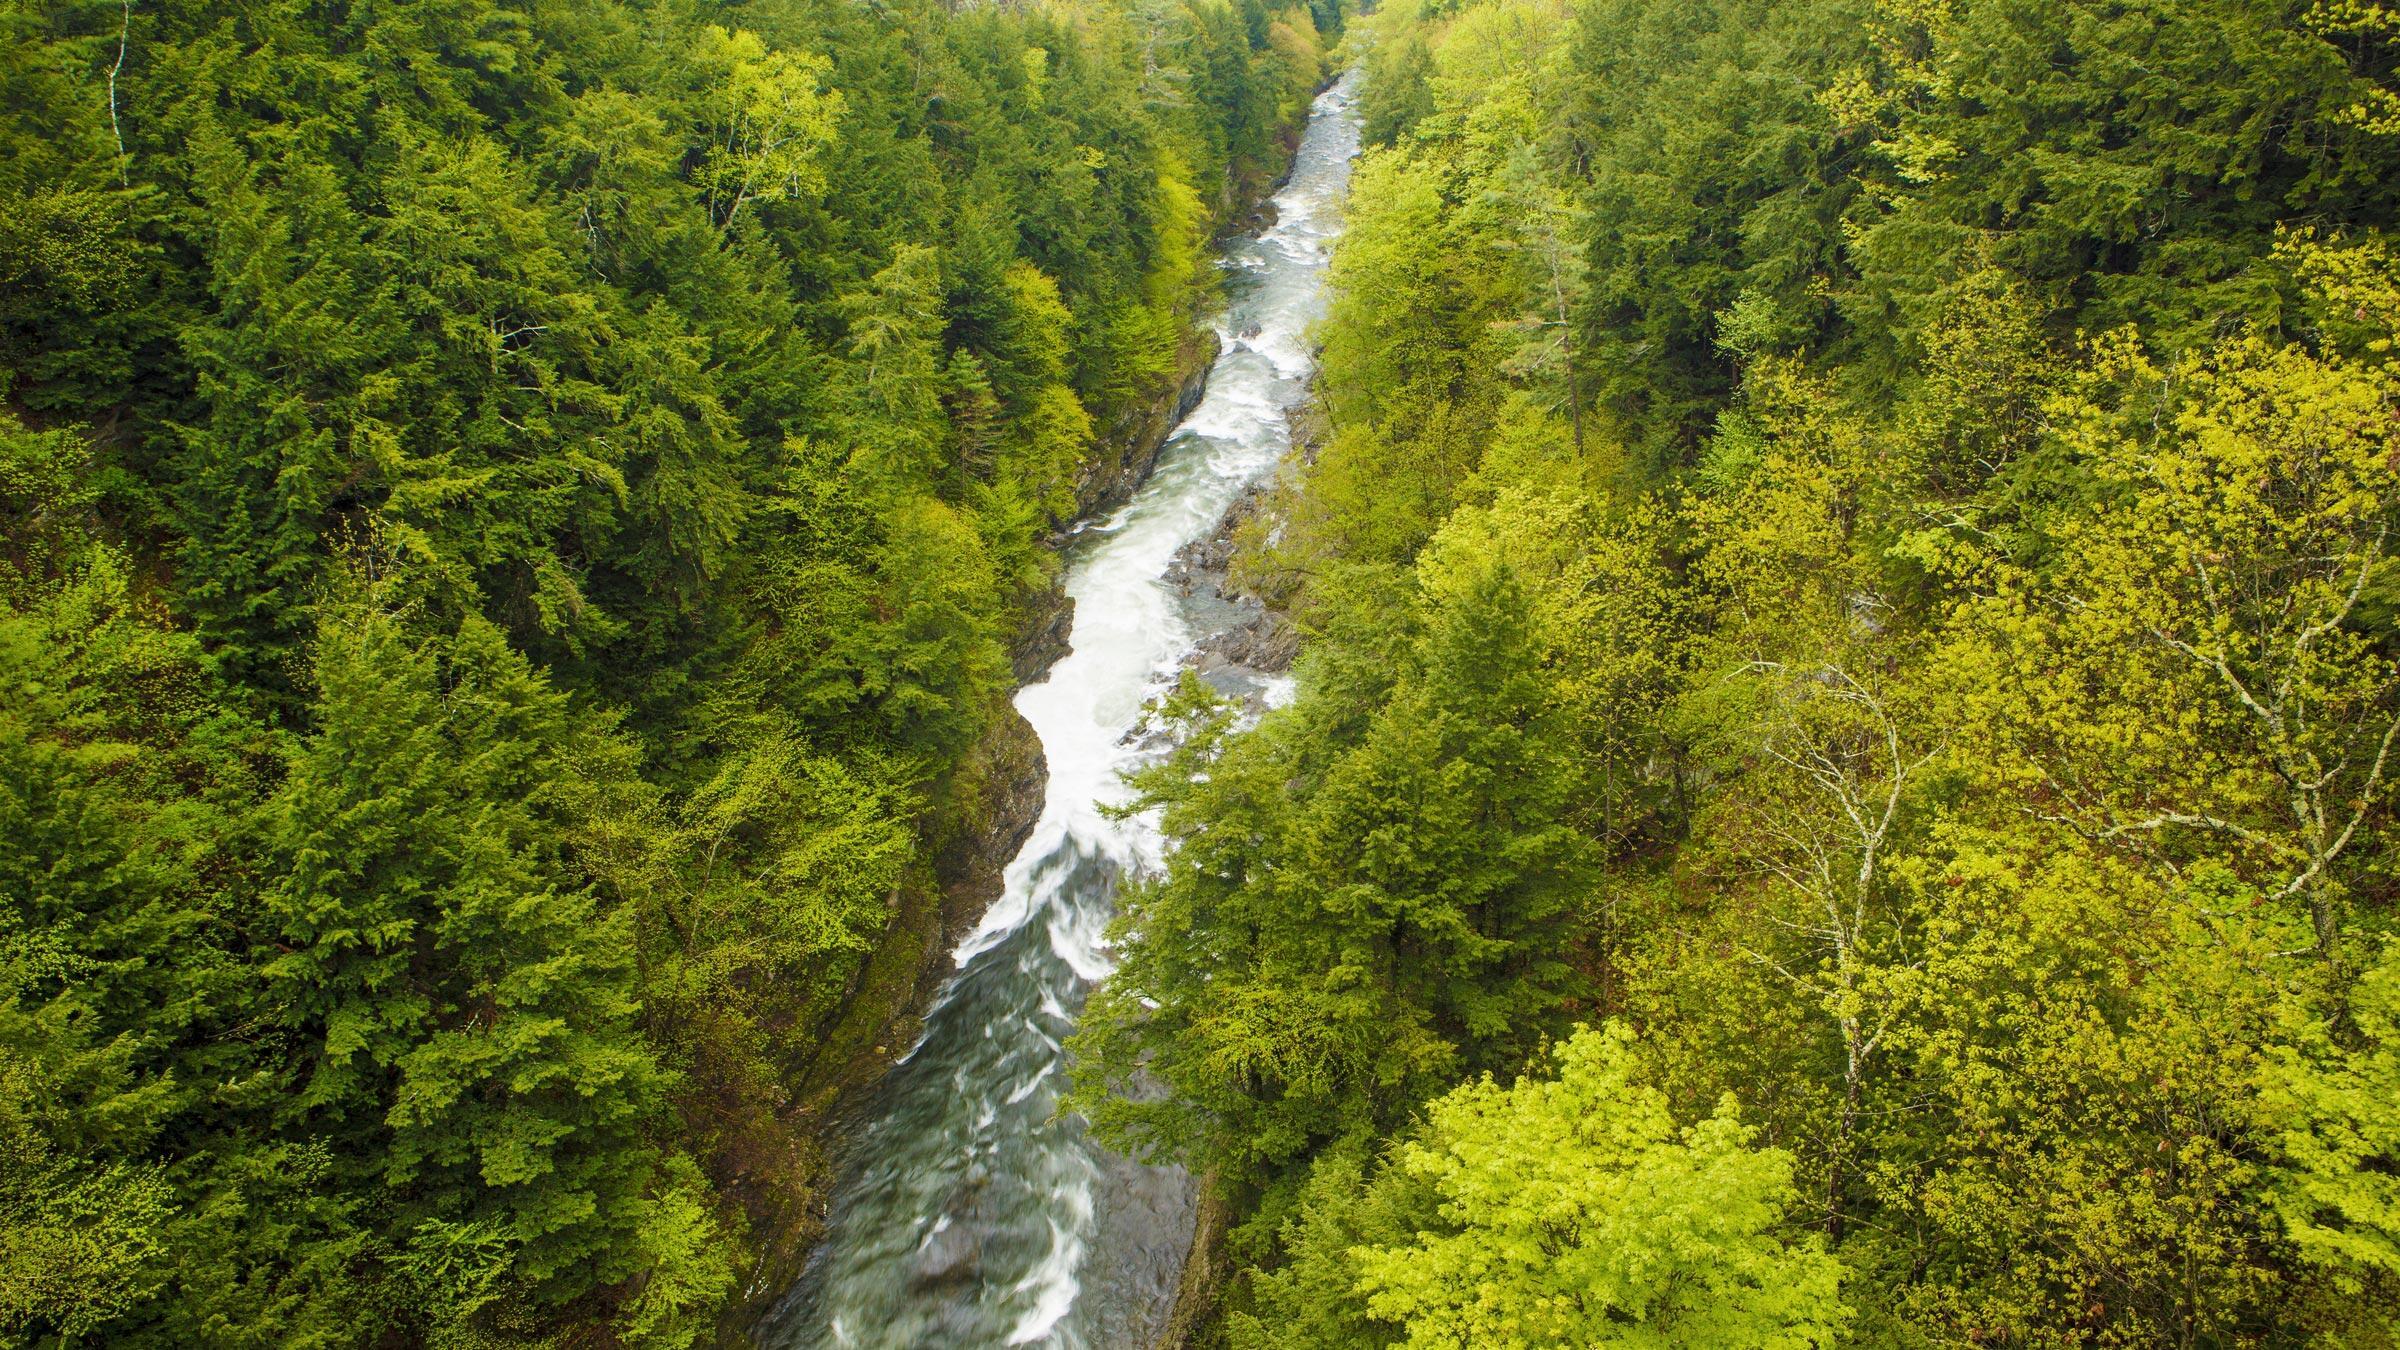 Monkman_Vermont. Quechee Gorge, Vermont. Jerry and Marcy Monkman/EcoPhotography